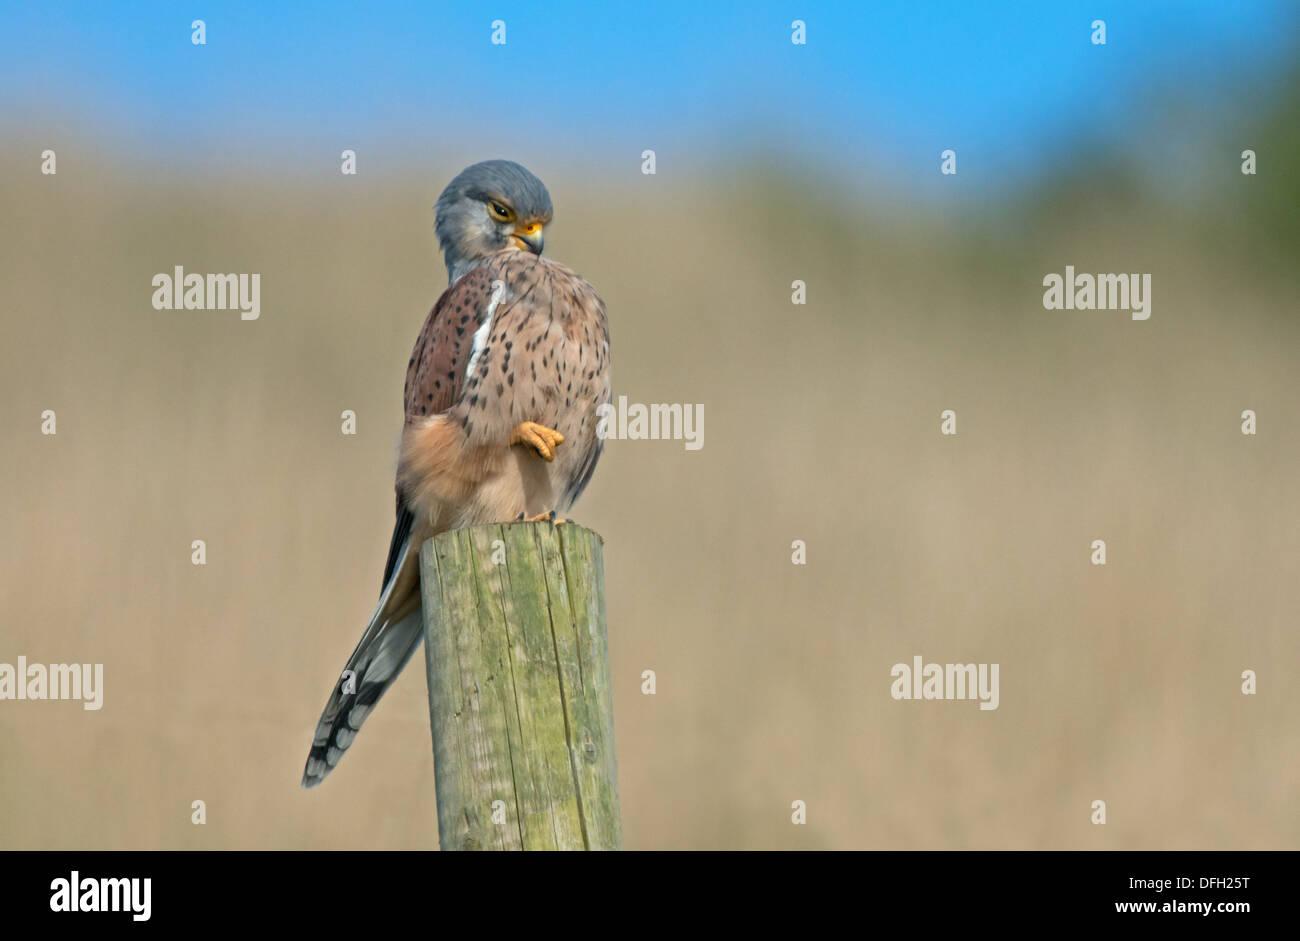 Male Kestrel, Falco-tinnunculus Perches On Fence Post, Preening, Uk - Stock Image